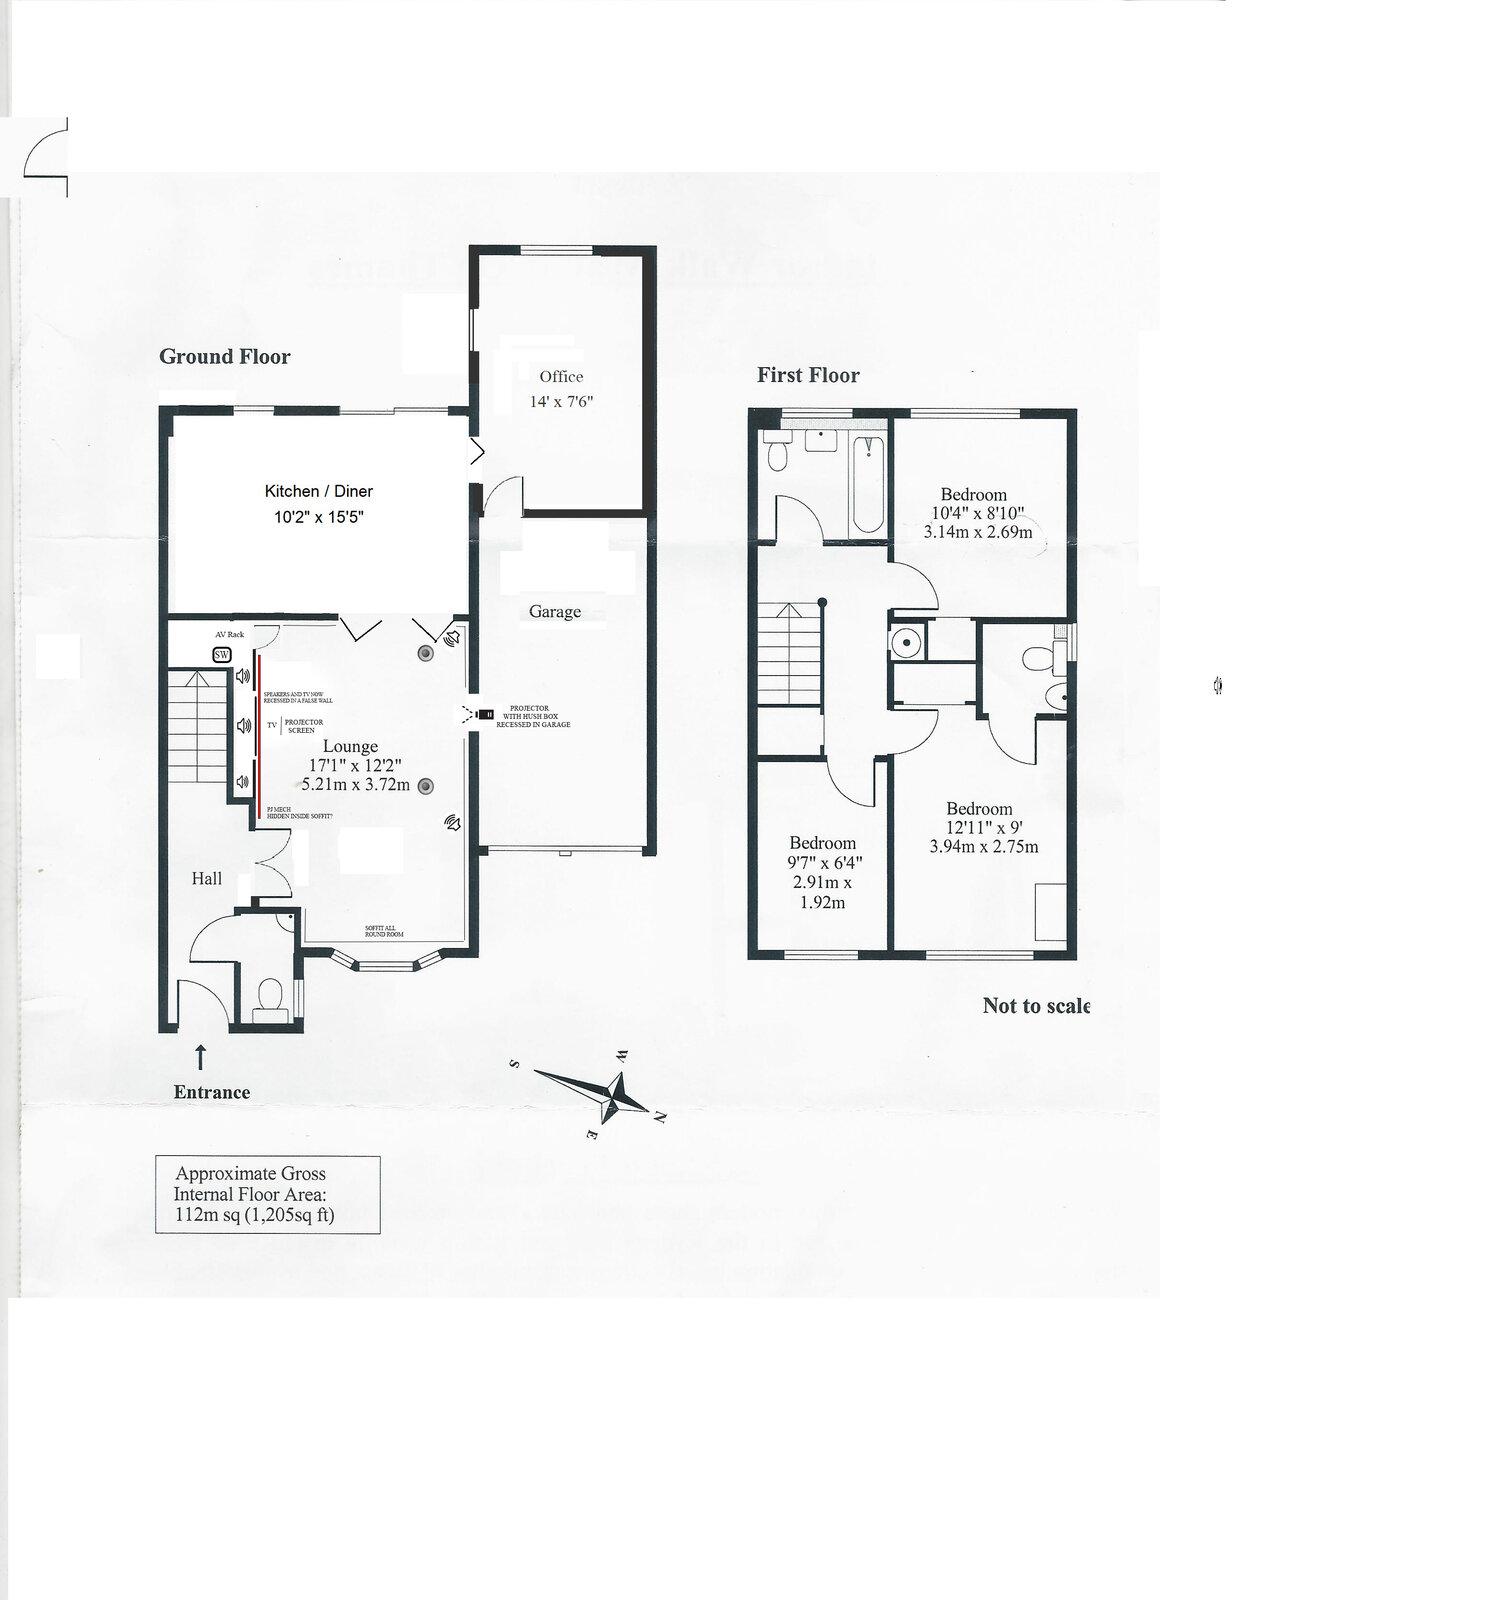 house plan 2 windsor walk proposed HT.jpg